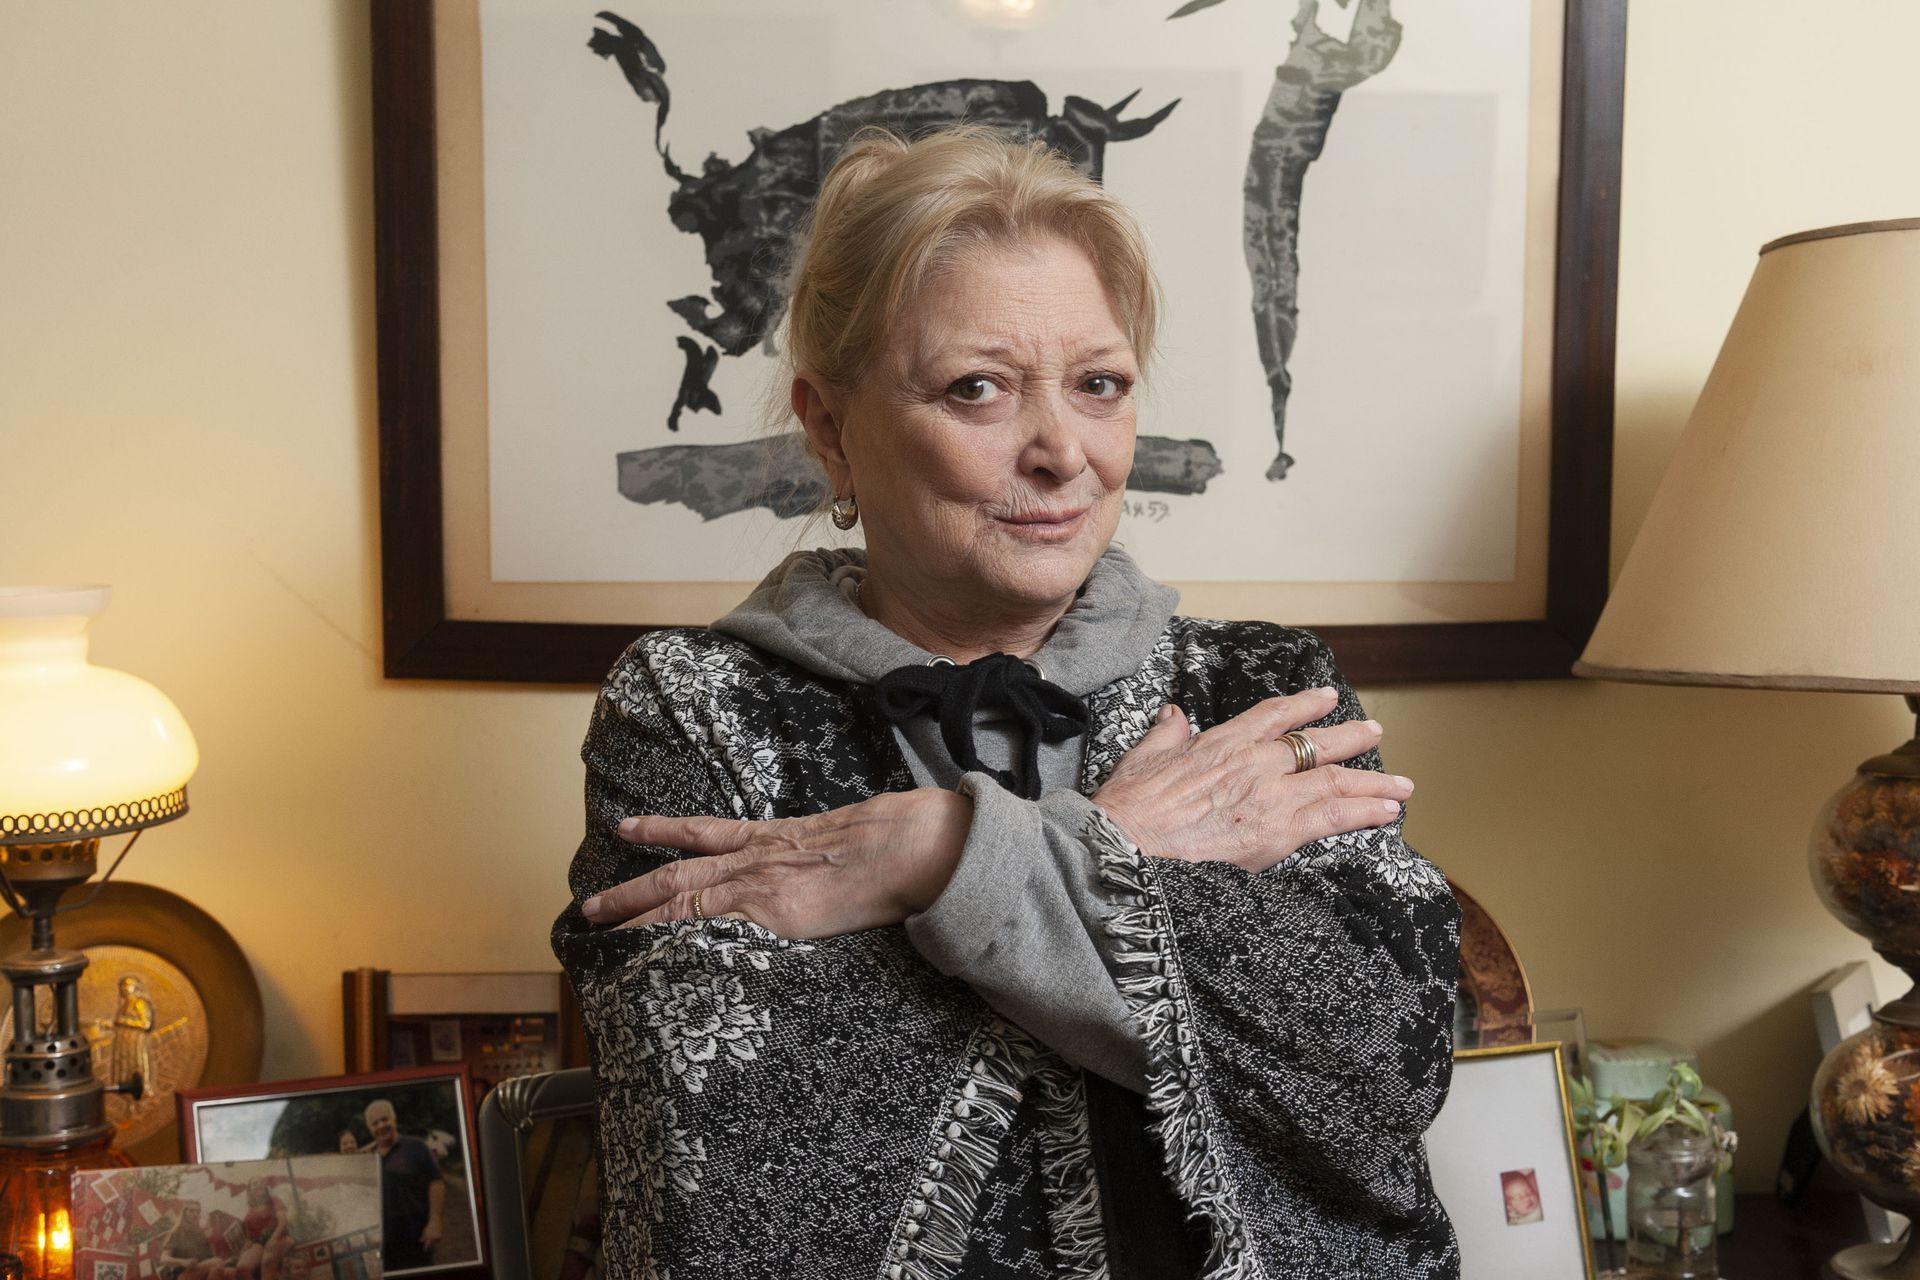 Graciela Pal reflexiona sobre su extensa trayectoria